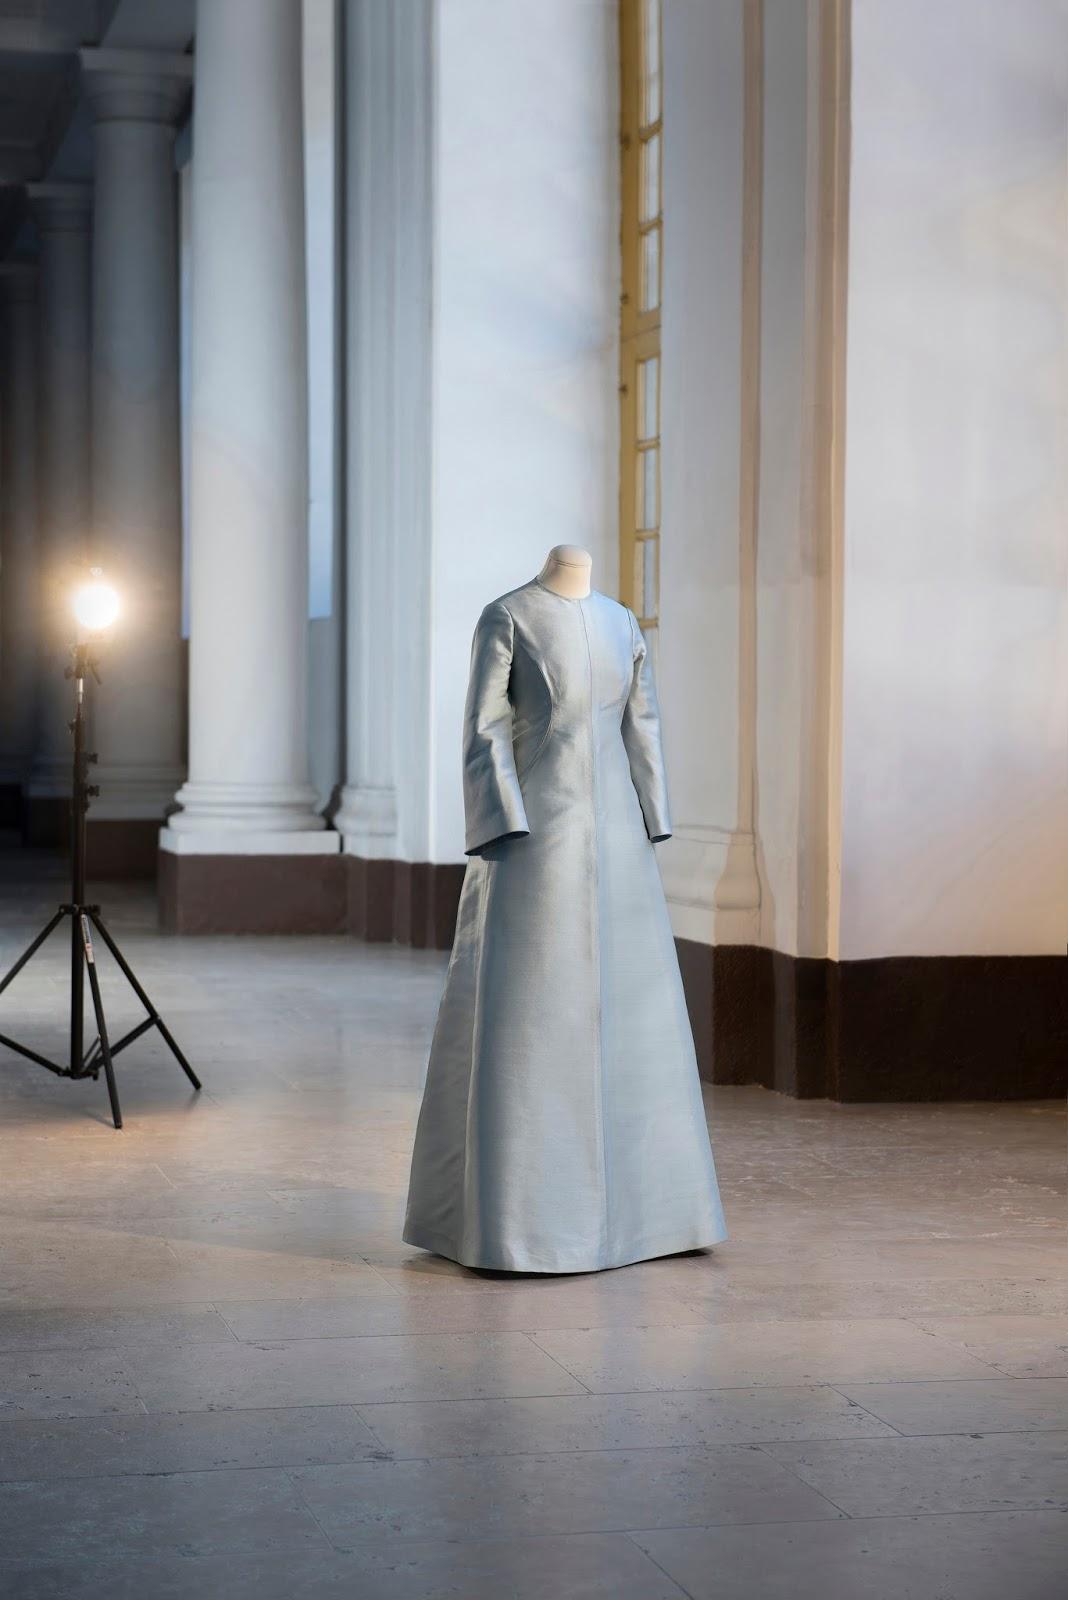 Queens of England: Sweden\'s Royal Wedding Dresses